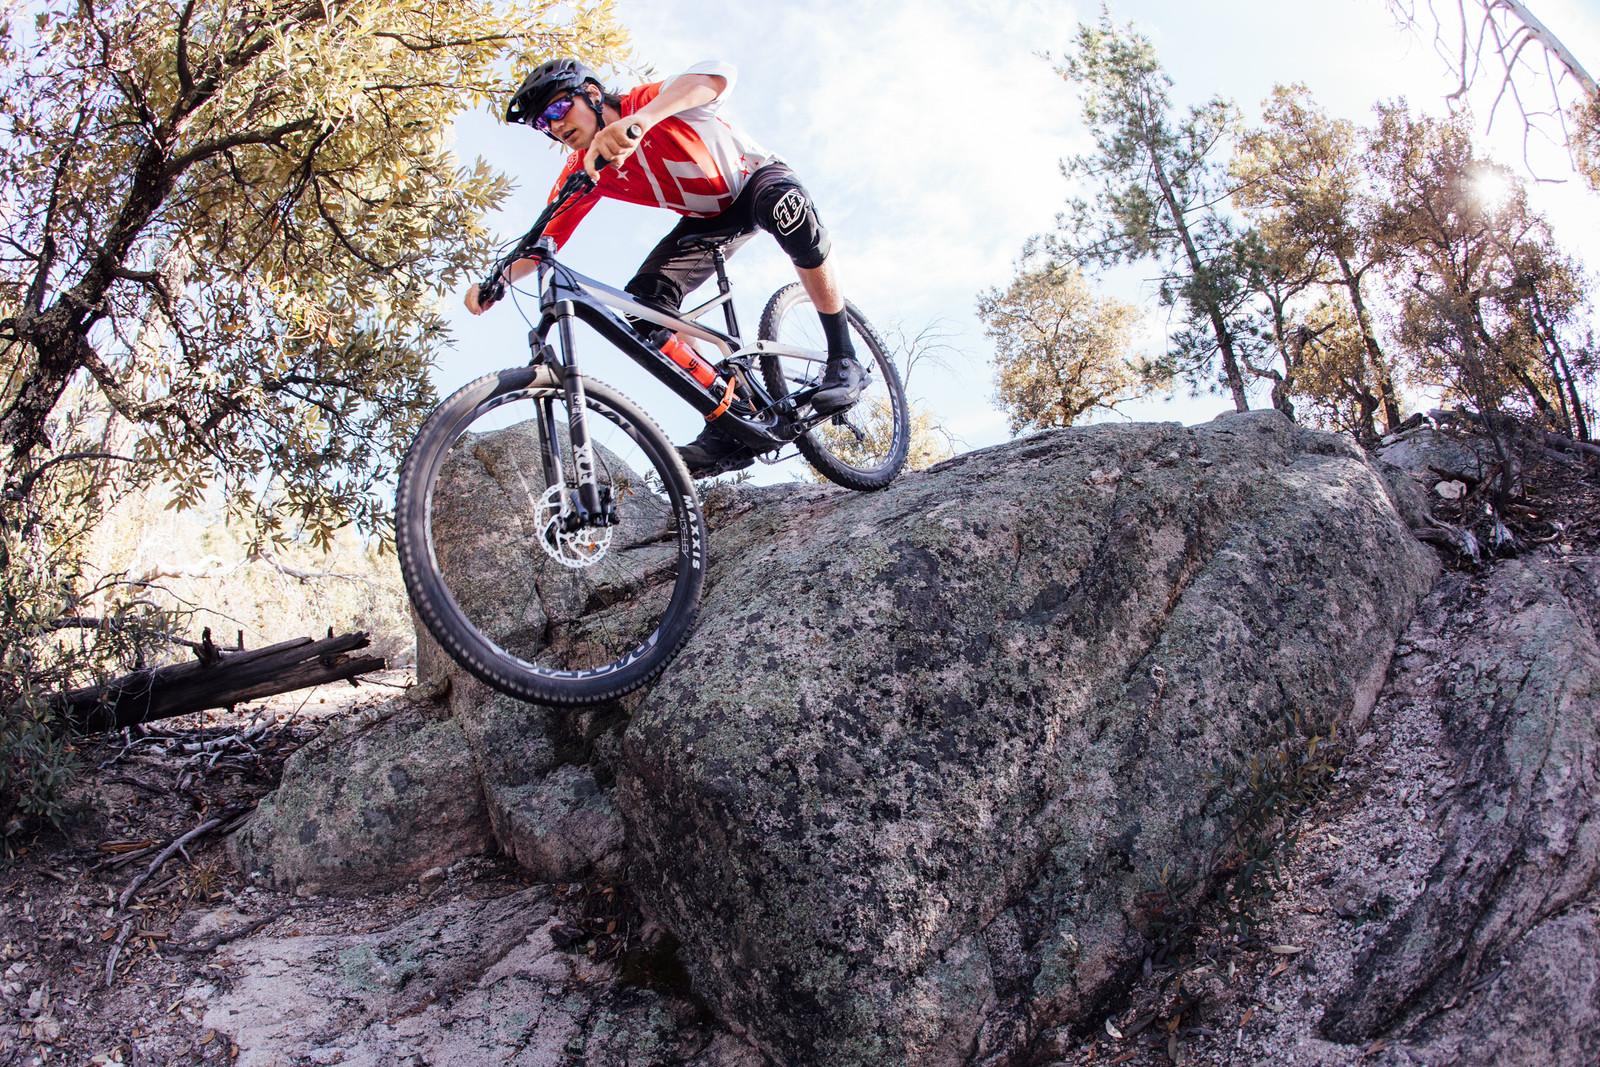 Devinci Django Carbon SLX / XT 29 - 2017 Vital MTB Test Sessions - Devinci Django Carbon SLX / XT 29 - 2017 Vital MTB Test Sessions - Mountain Biking Pictures - Vital MTB